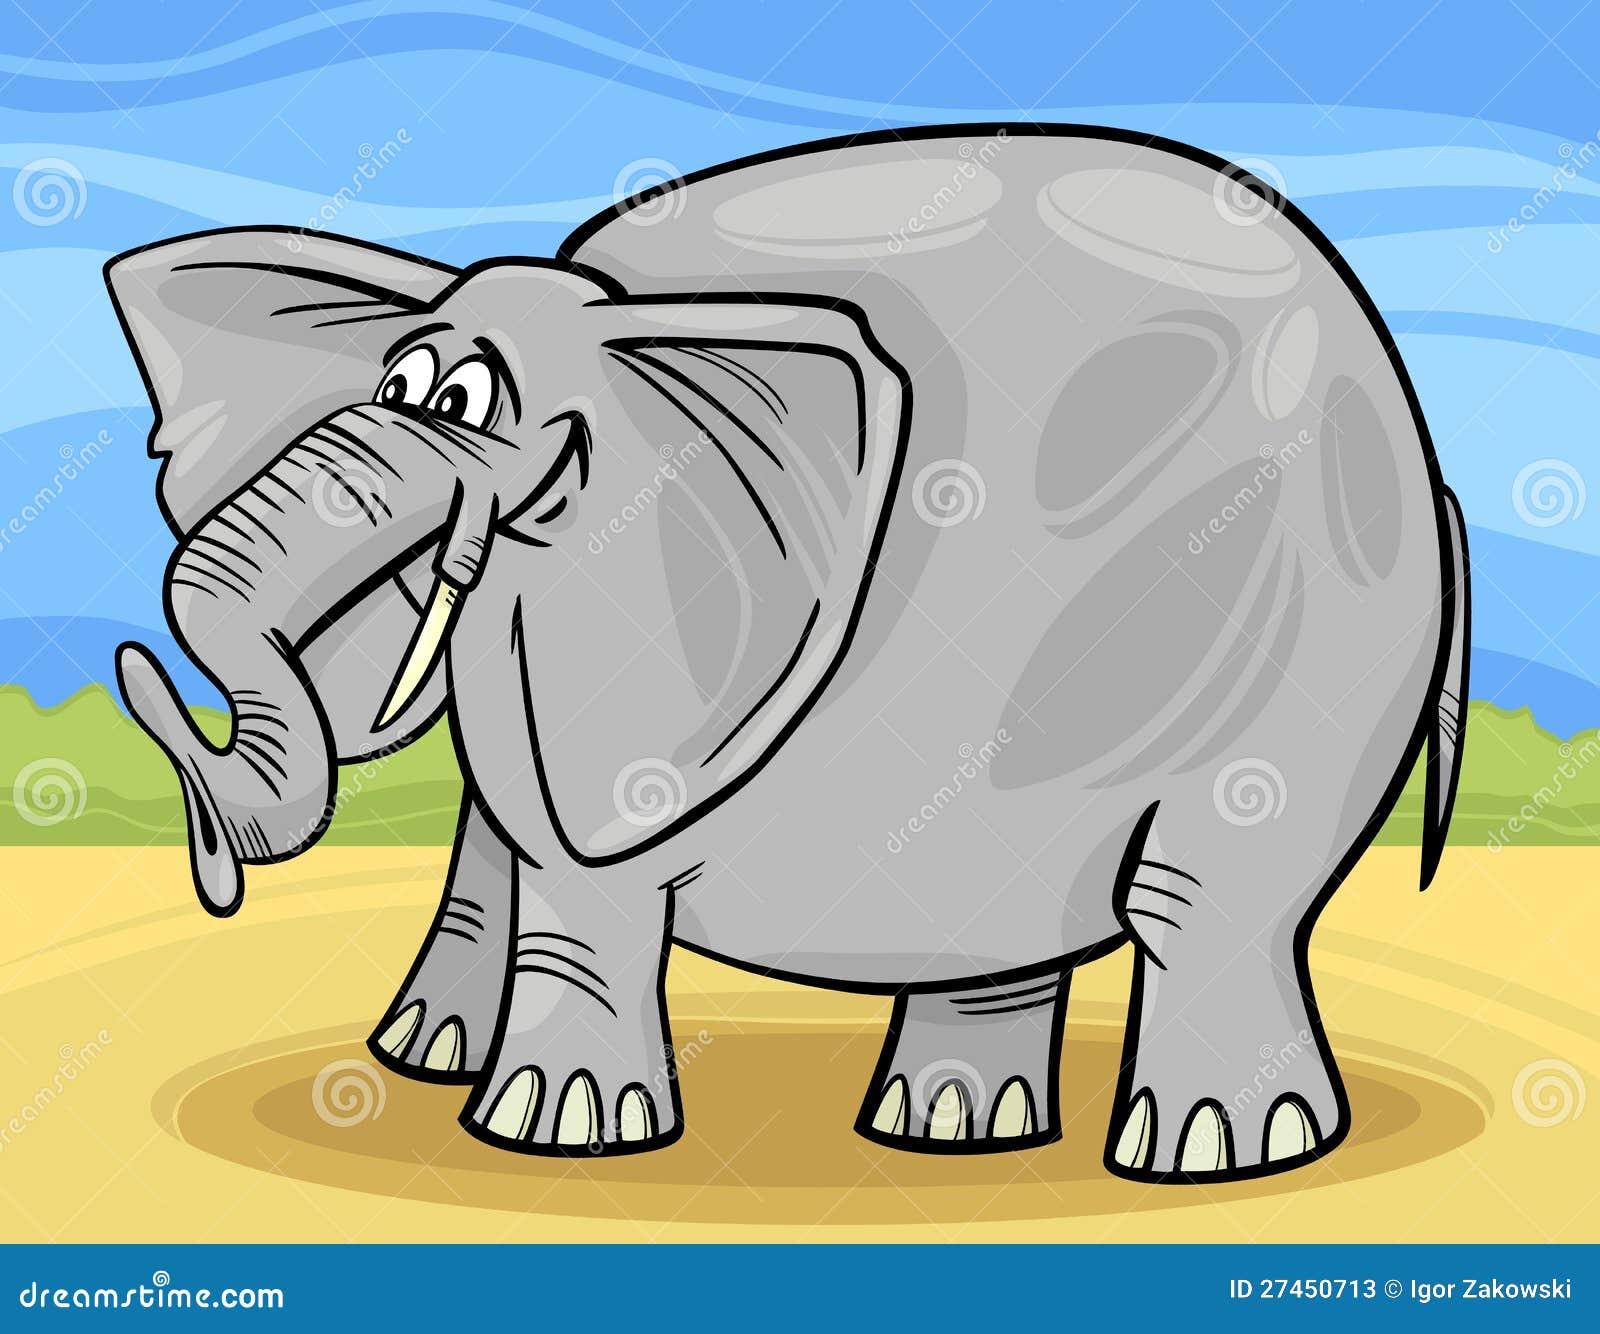 Funny elephant cartoon illustration stock photos image